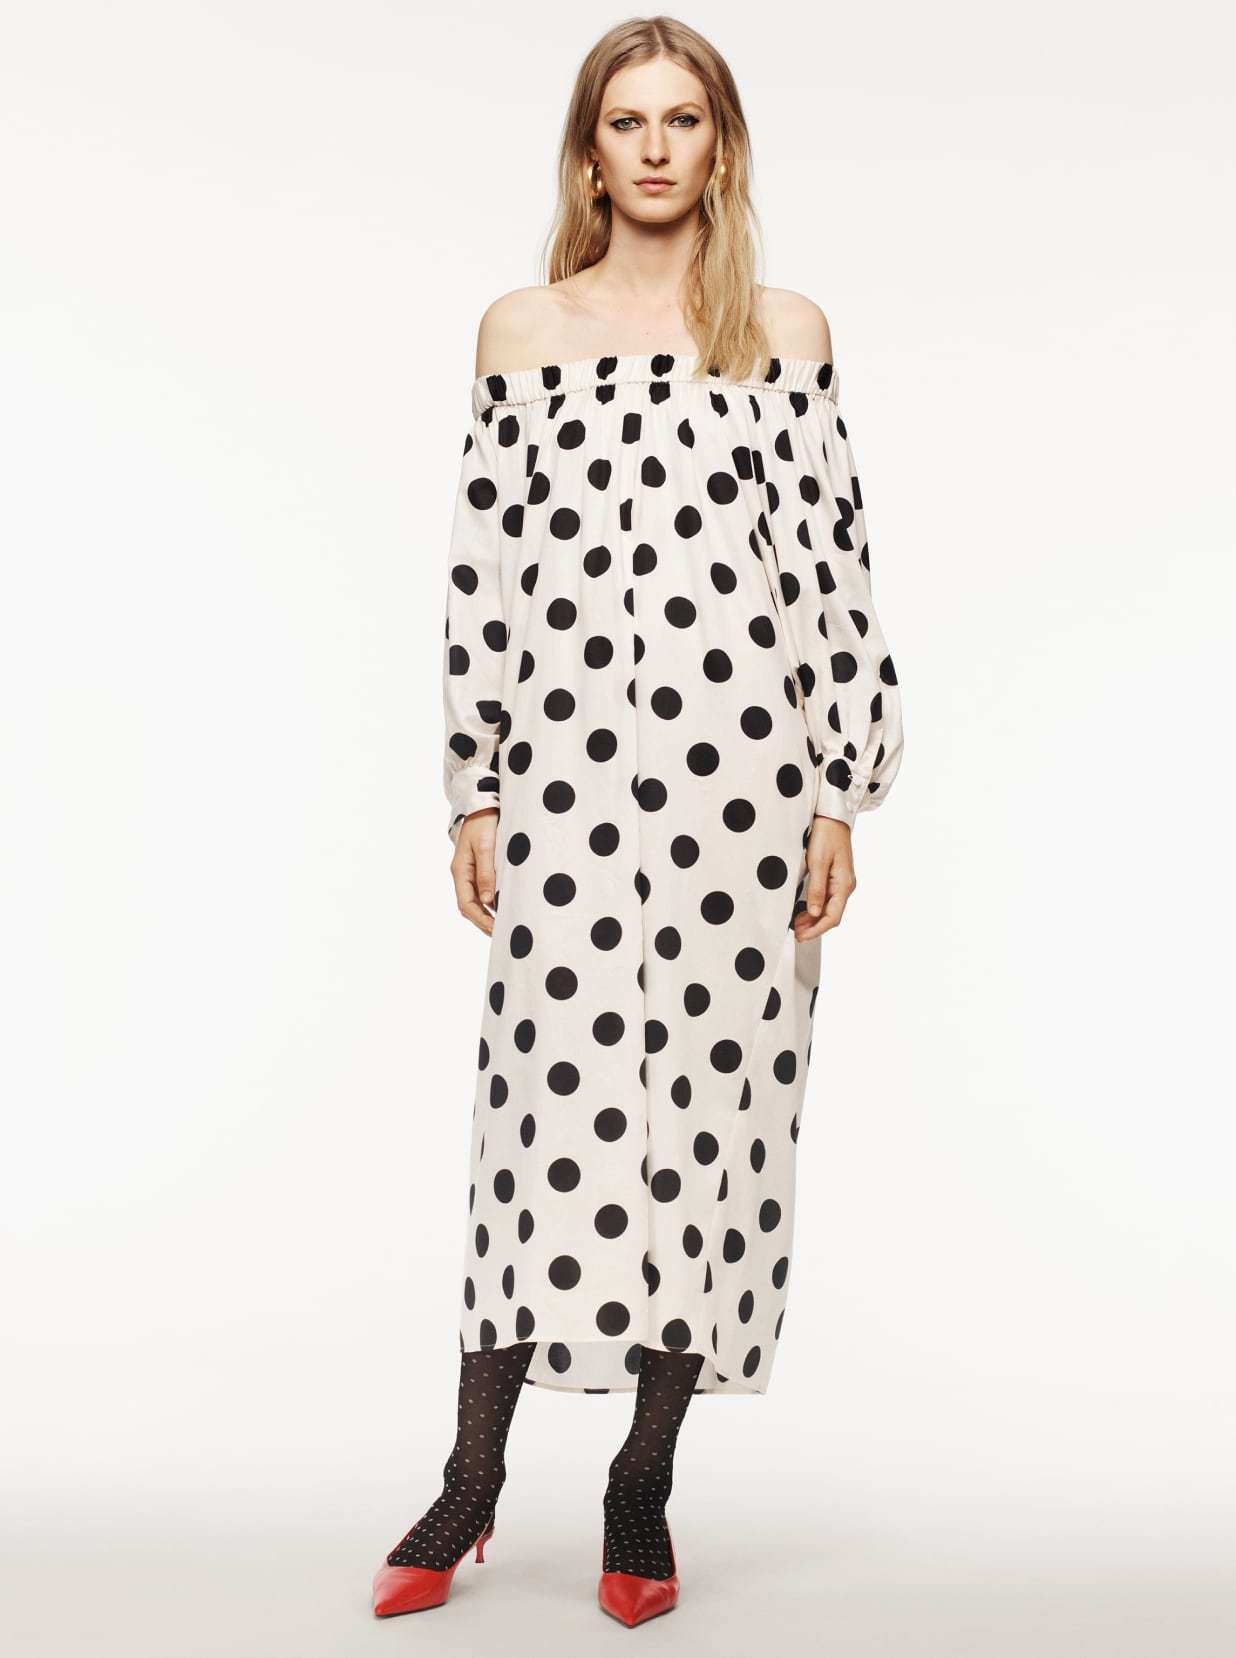 Vestido de lunares de Zara.